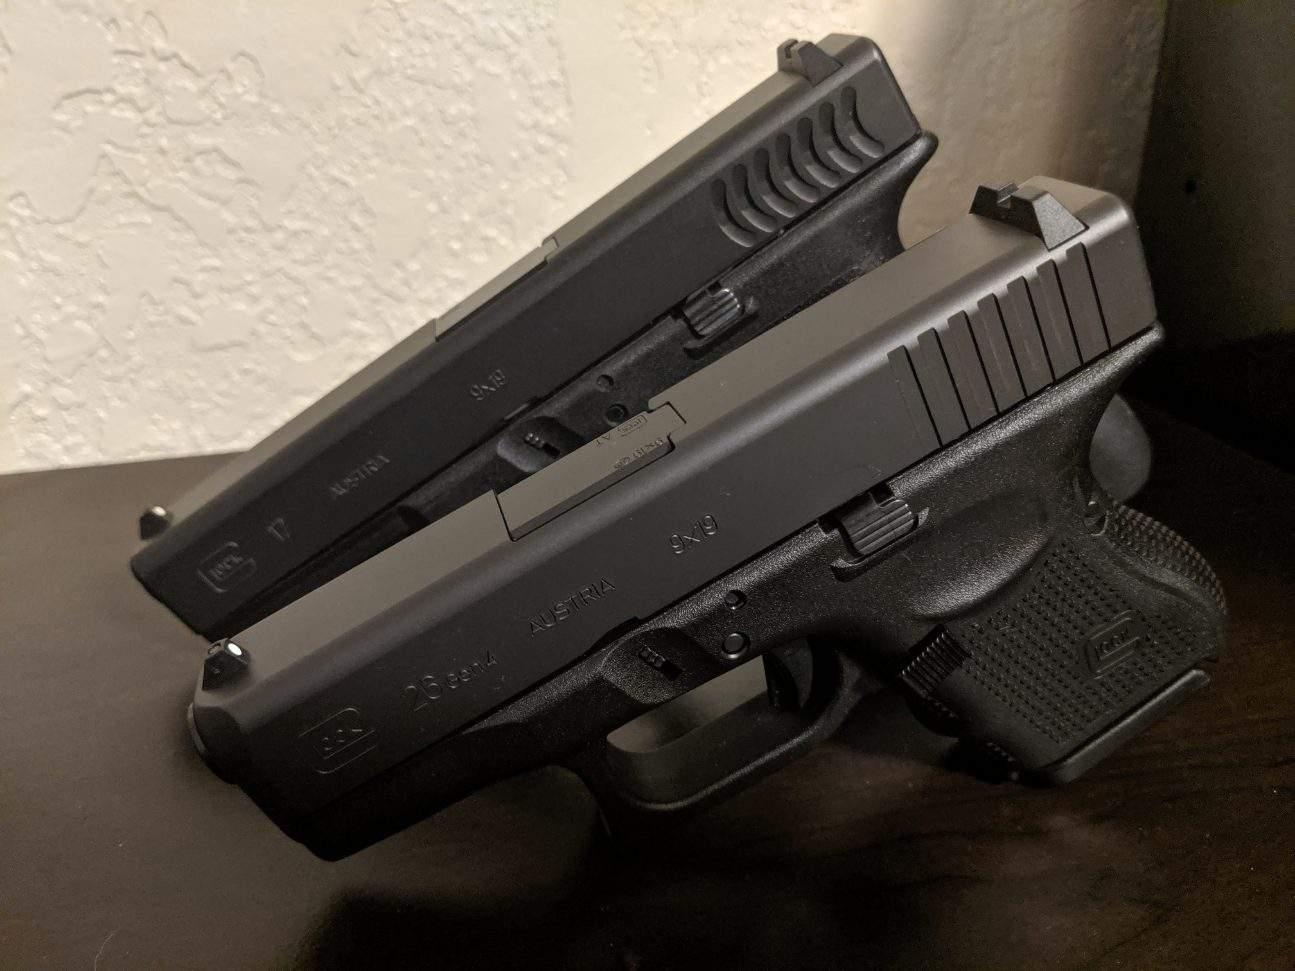 New EDC - Glock 26 or 19-img_20190626_195852_01_1561599910876.jpg